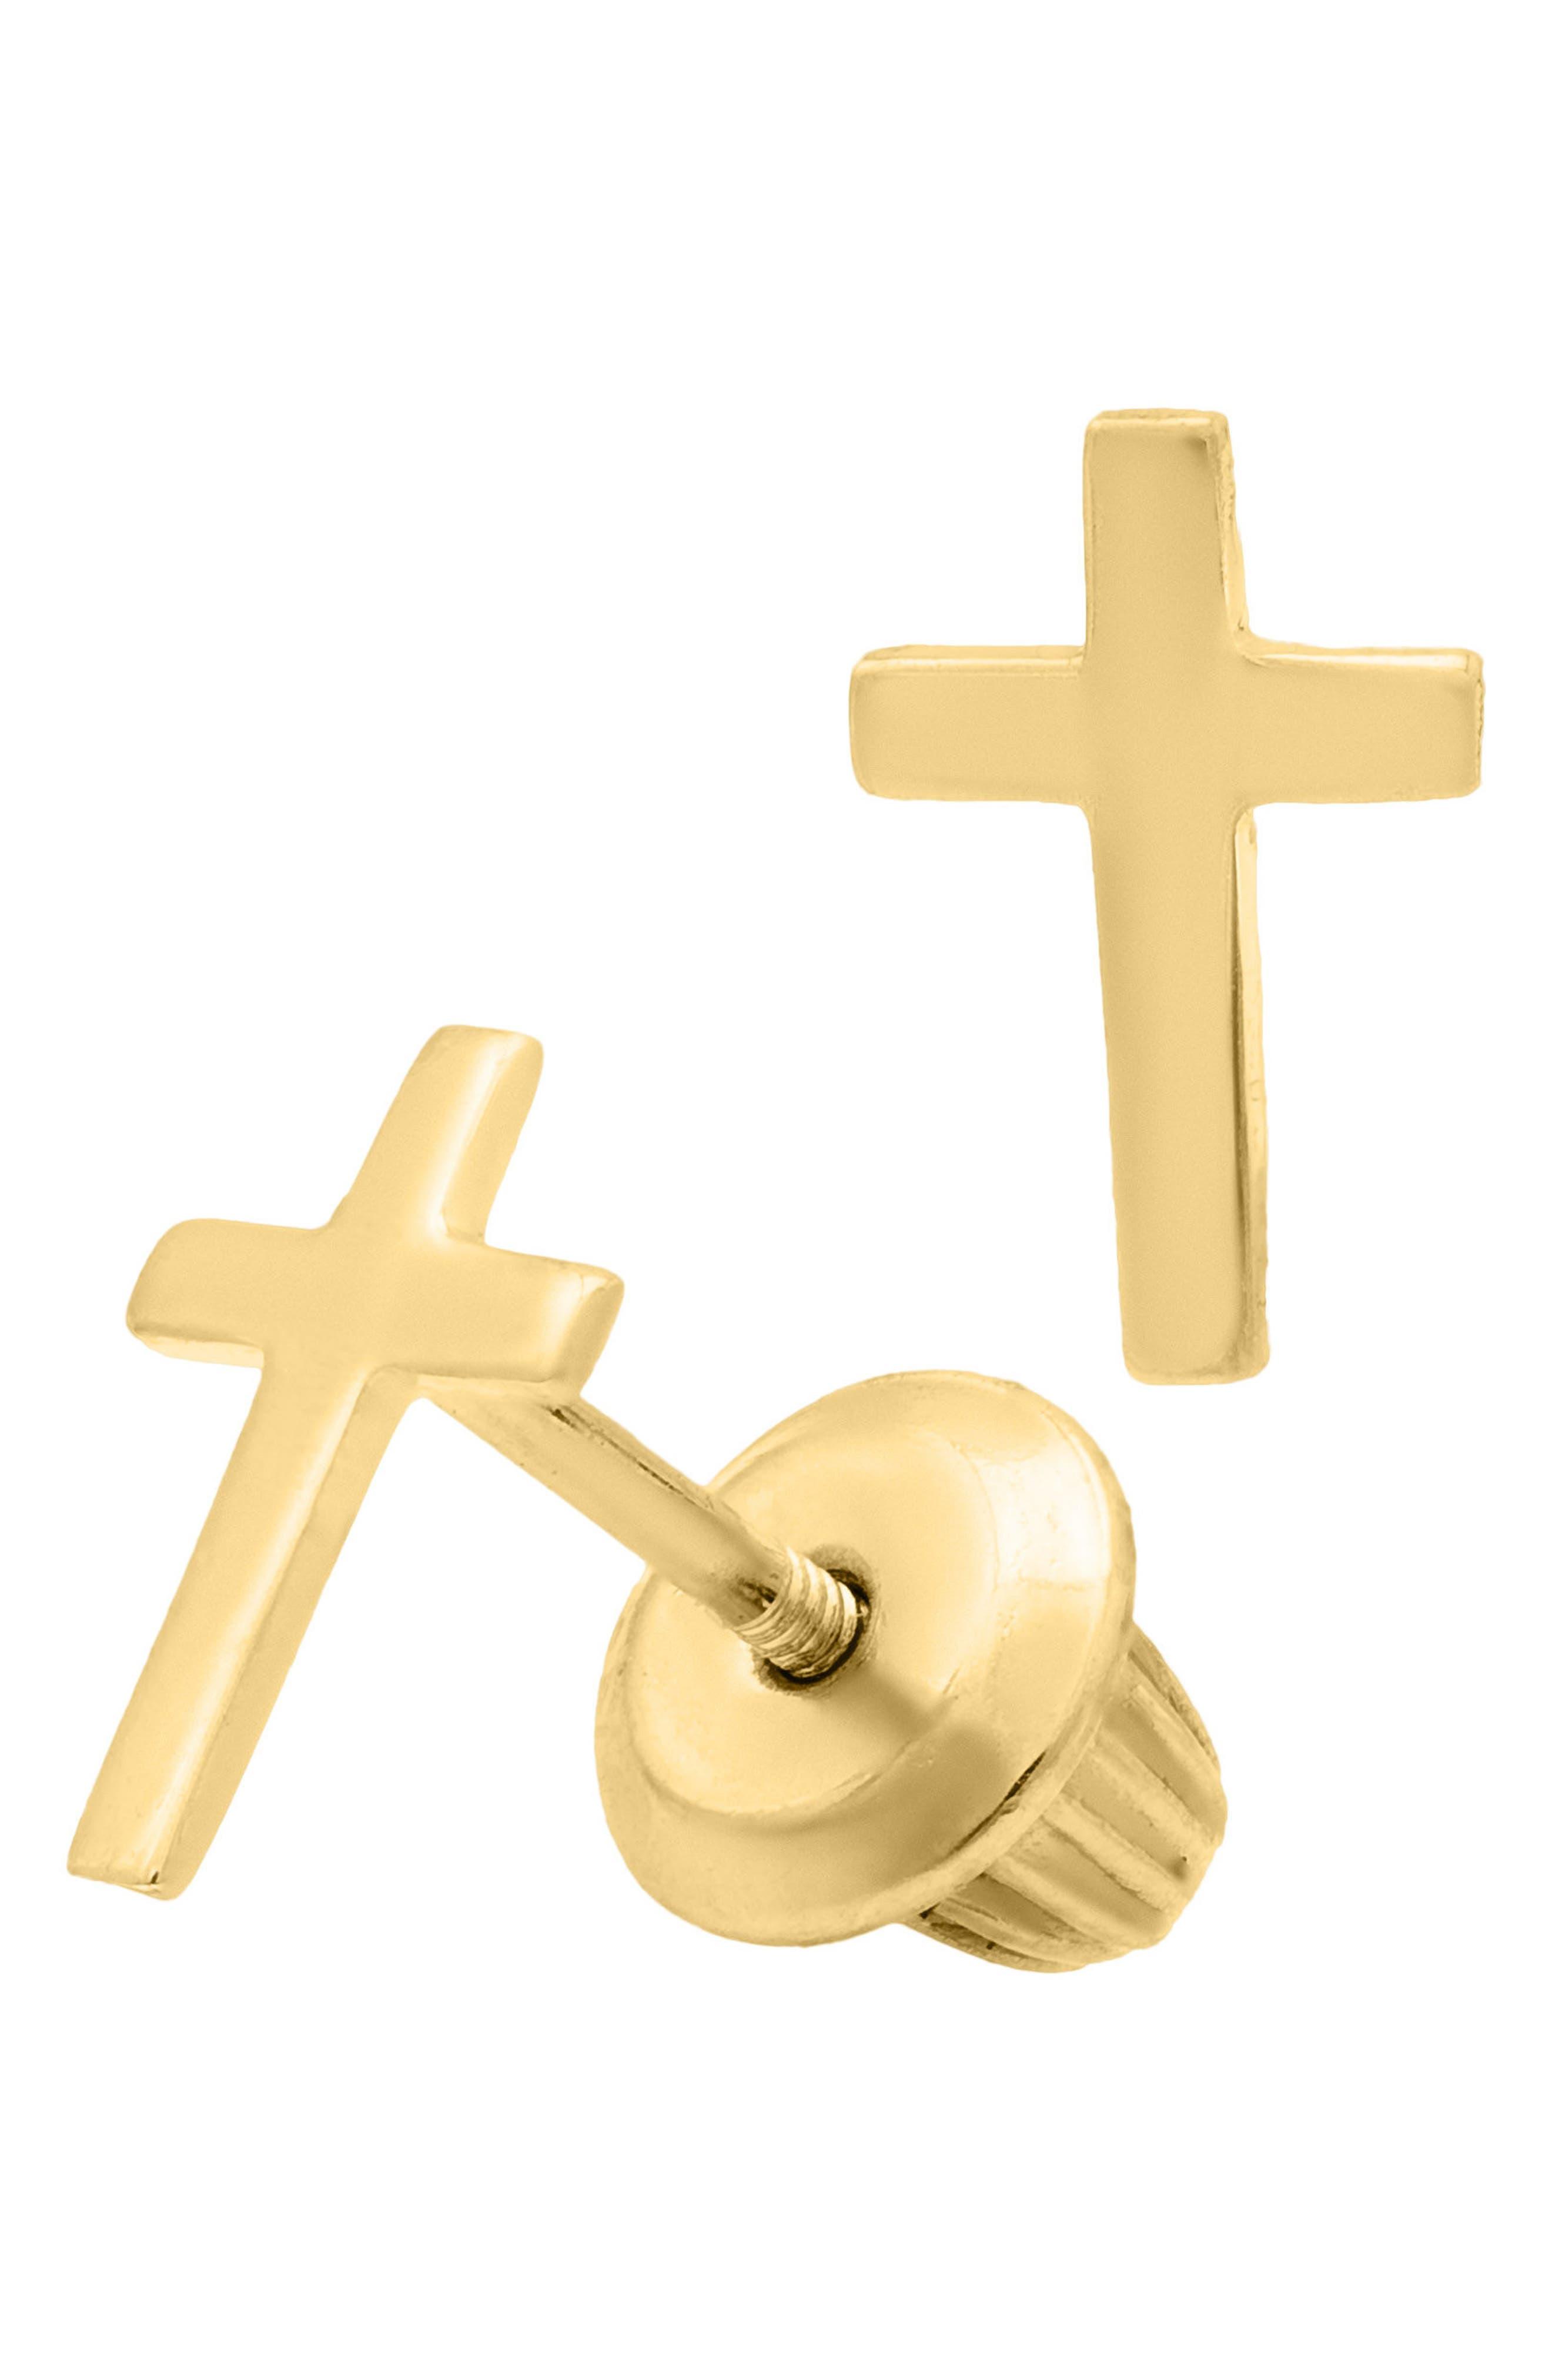 14k Gold Cross Stud Earrings,                         Main,                         color, Gold